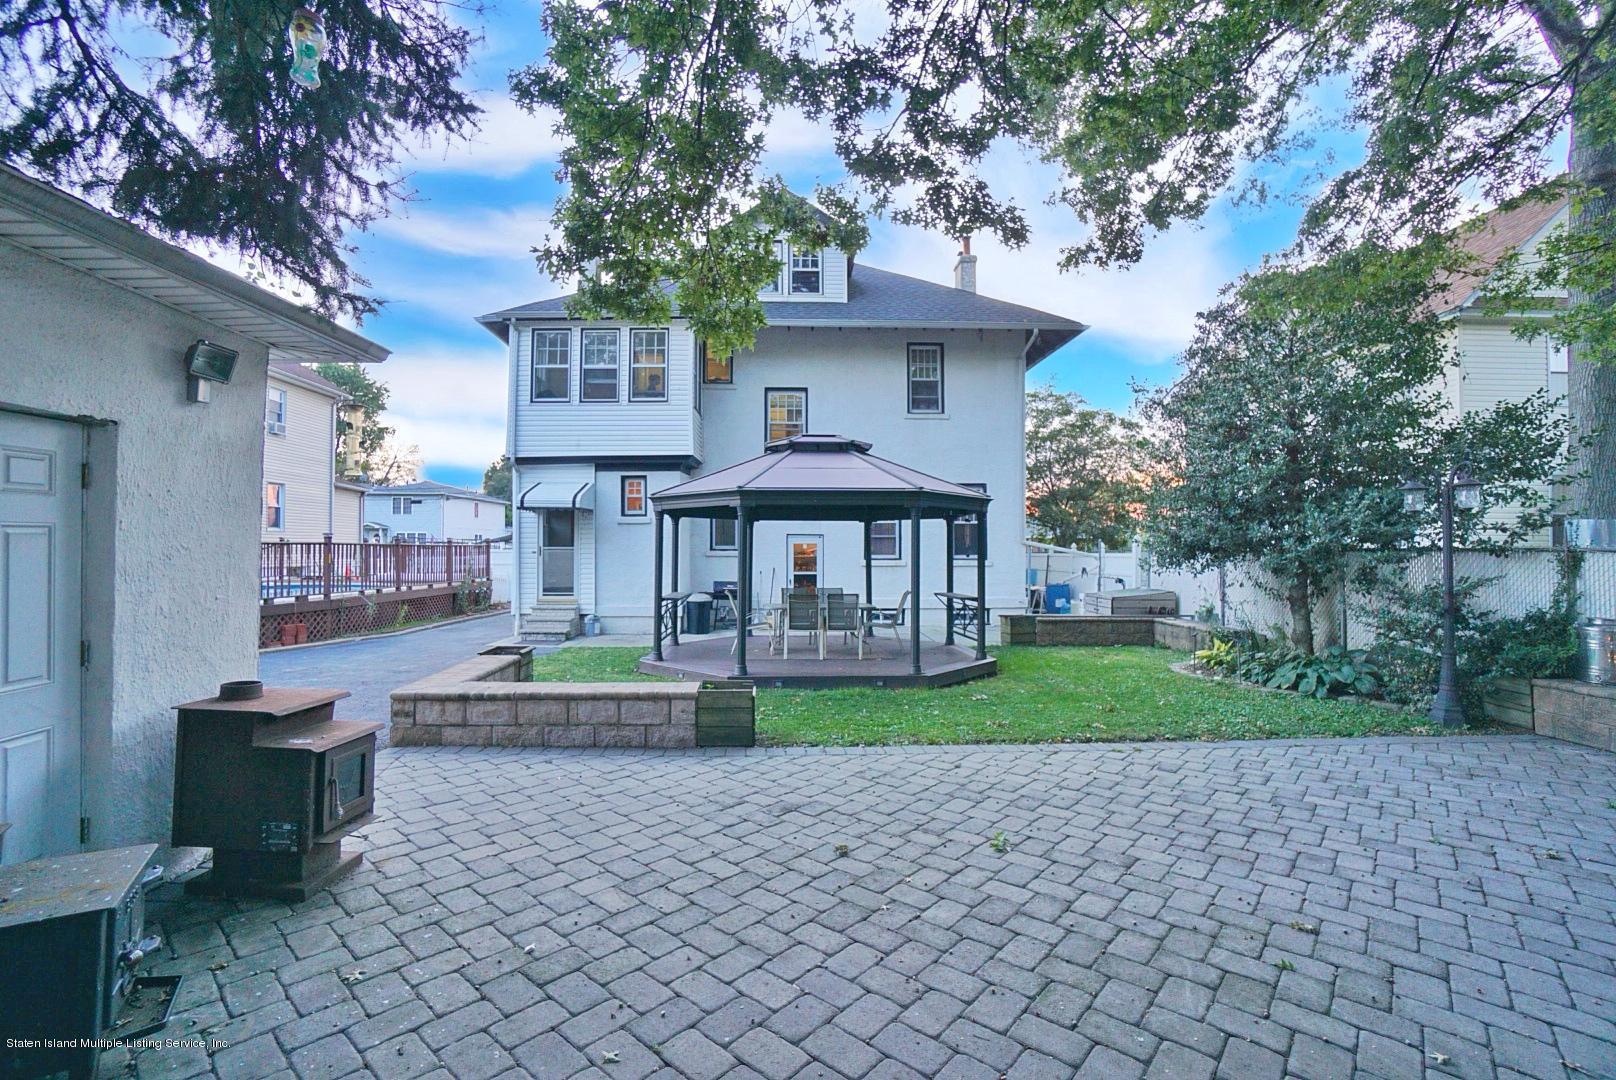 Single Family - Detached 31 Pelton Avenue  Staten Island, NY 10310, MLS-1132177-32